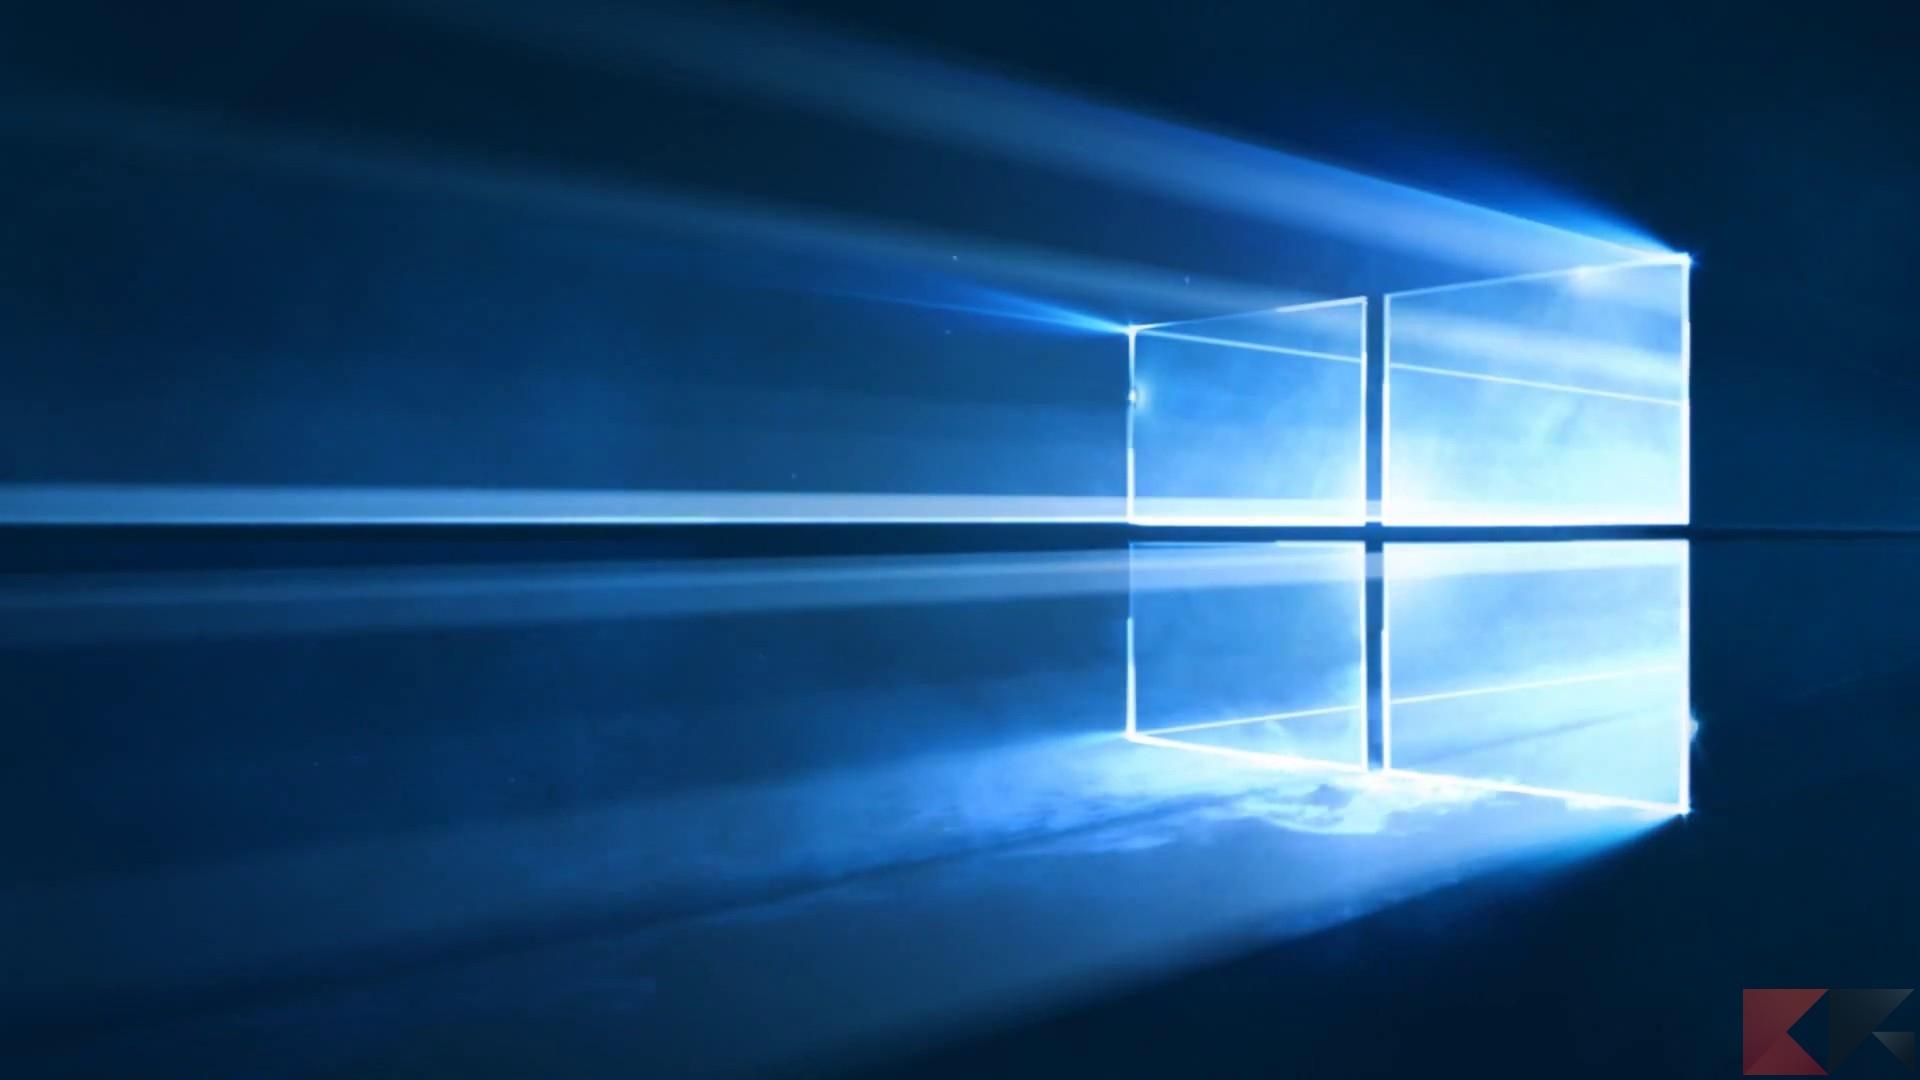 windows-10-hero